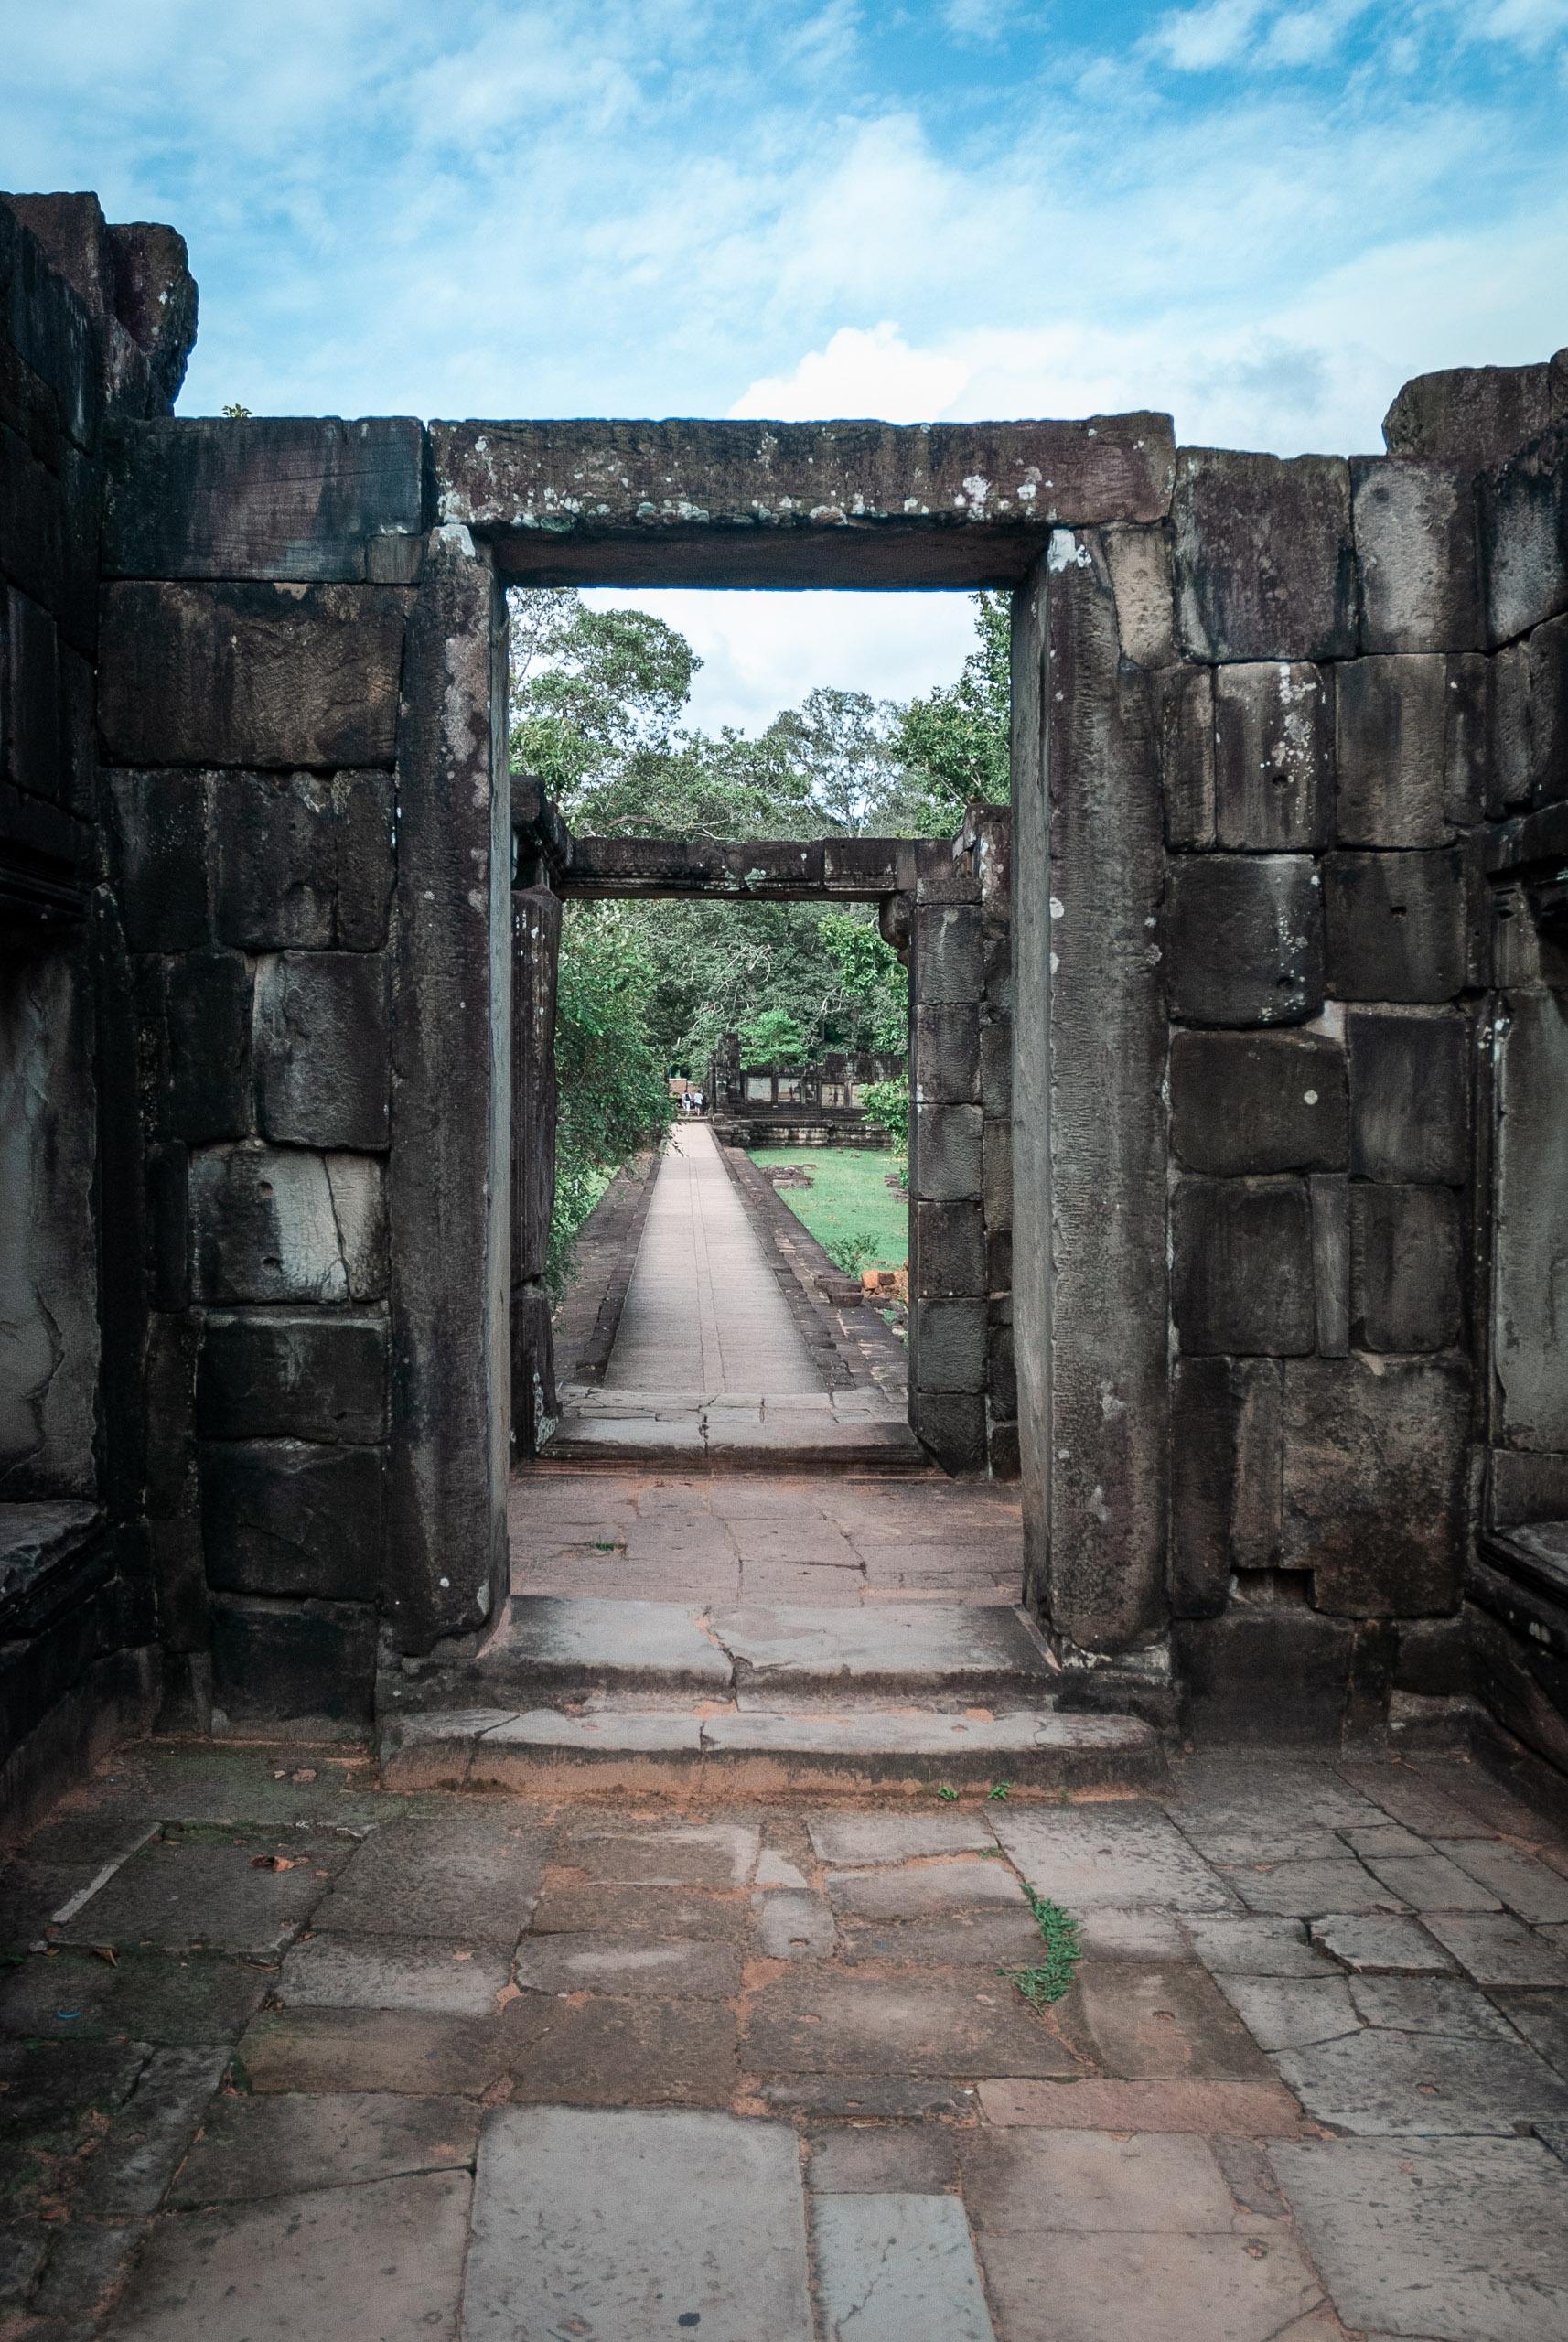 Cambodia - Angkor Wat - 2007-0626-DSC_0007_13270